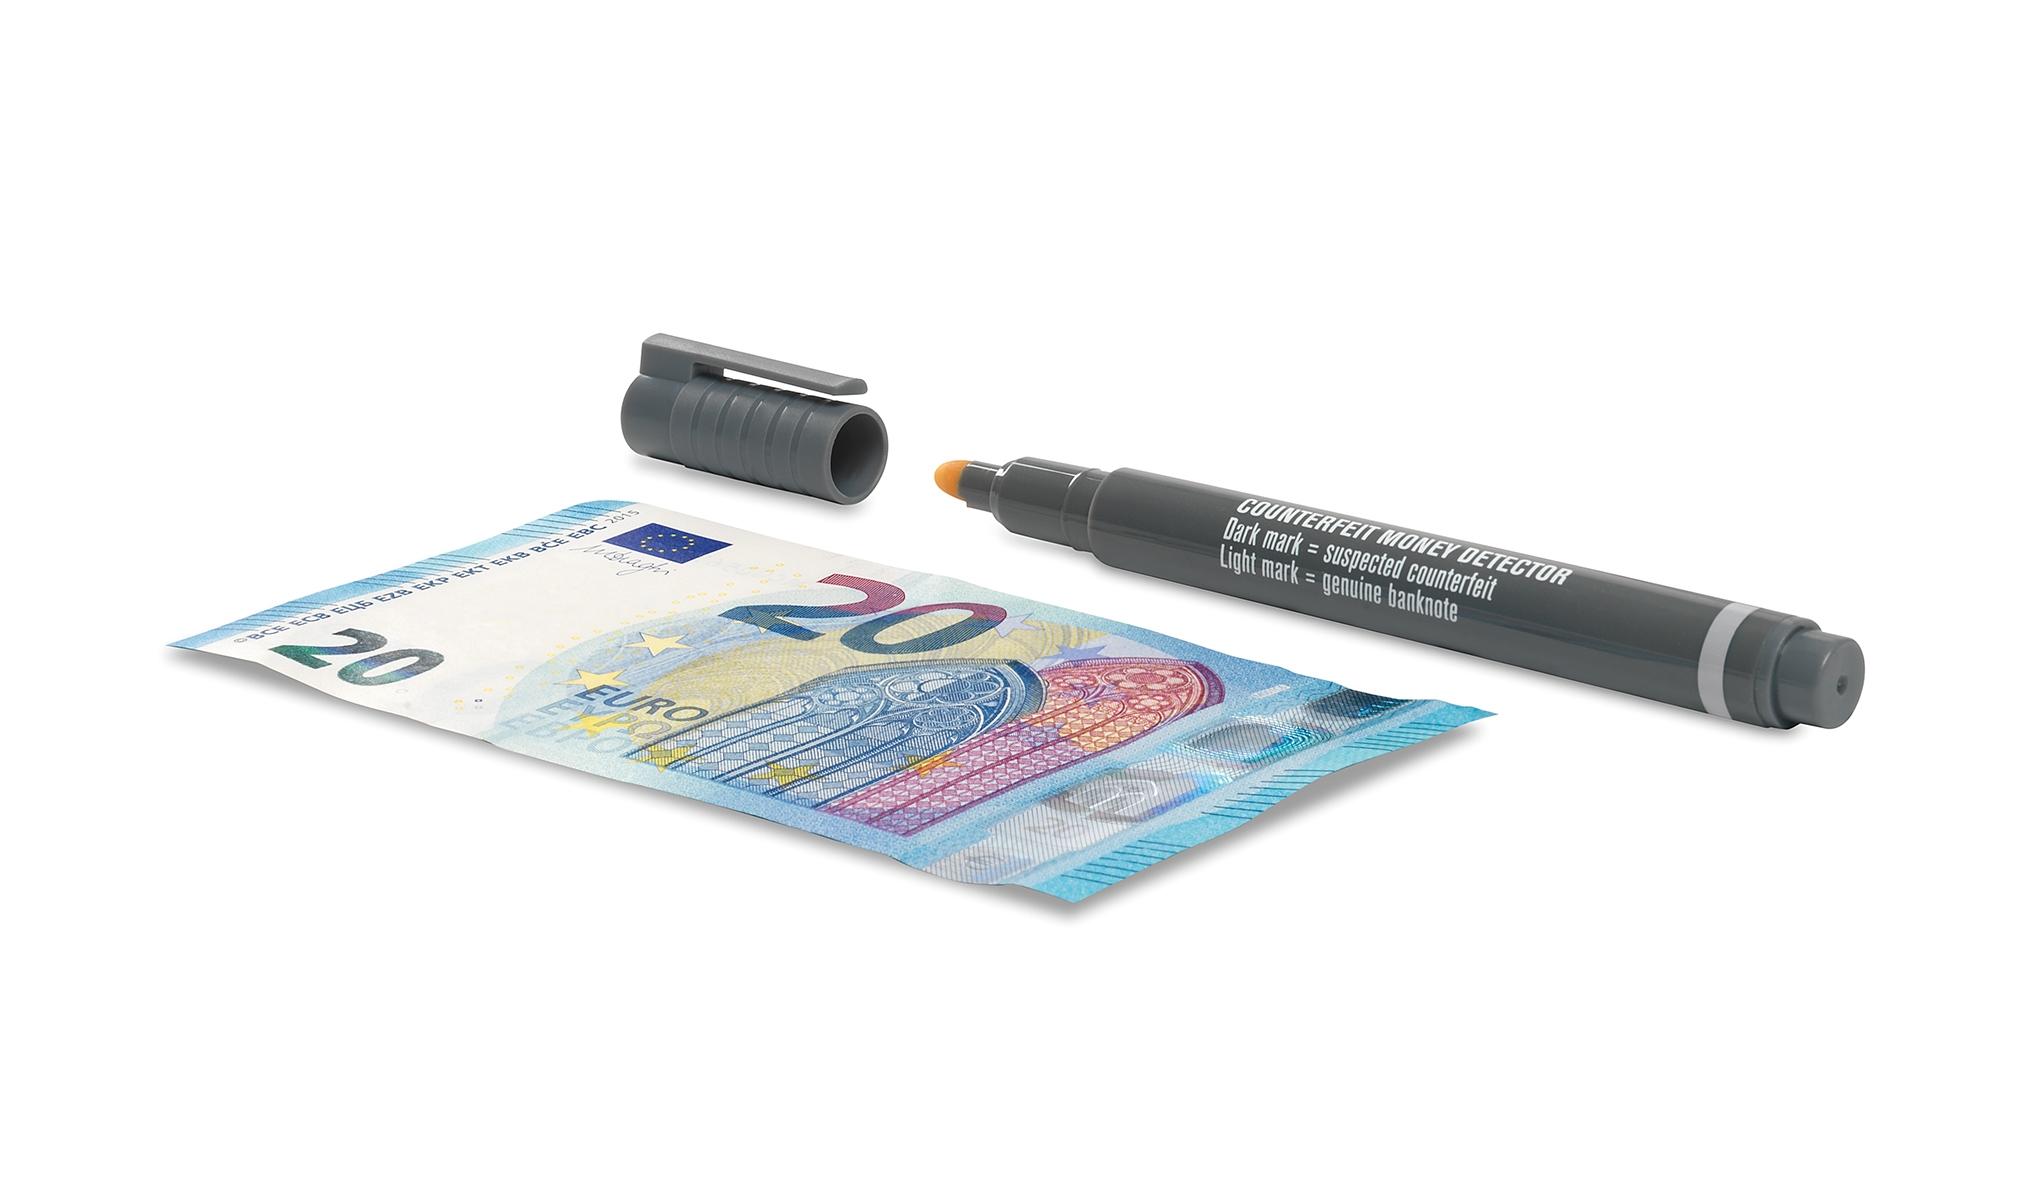 safescan-30-falschgeld-detektor-stift